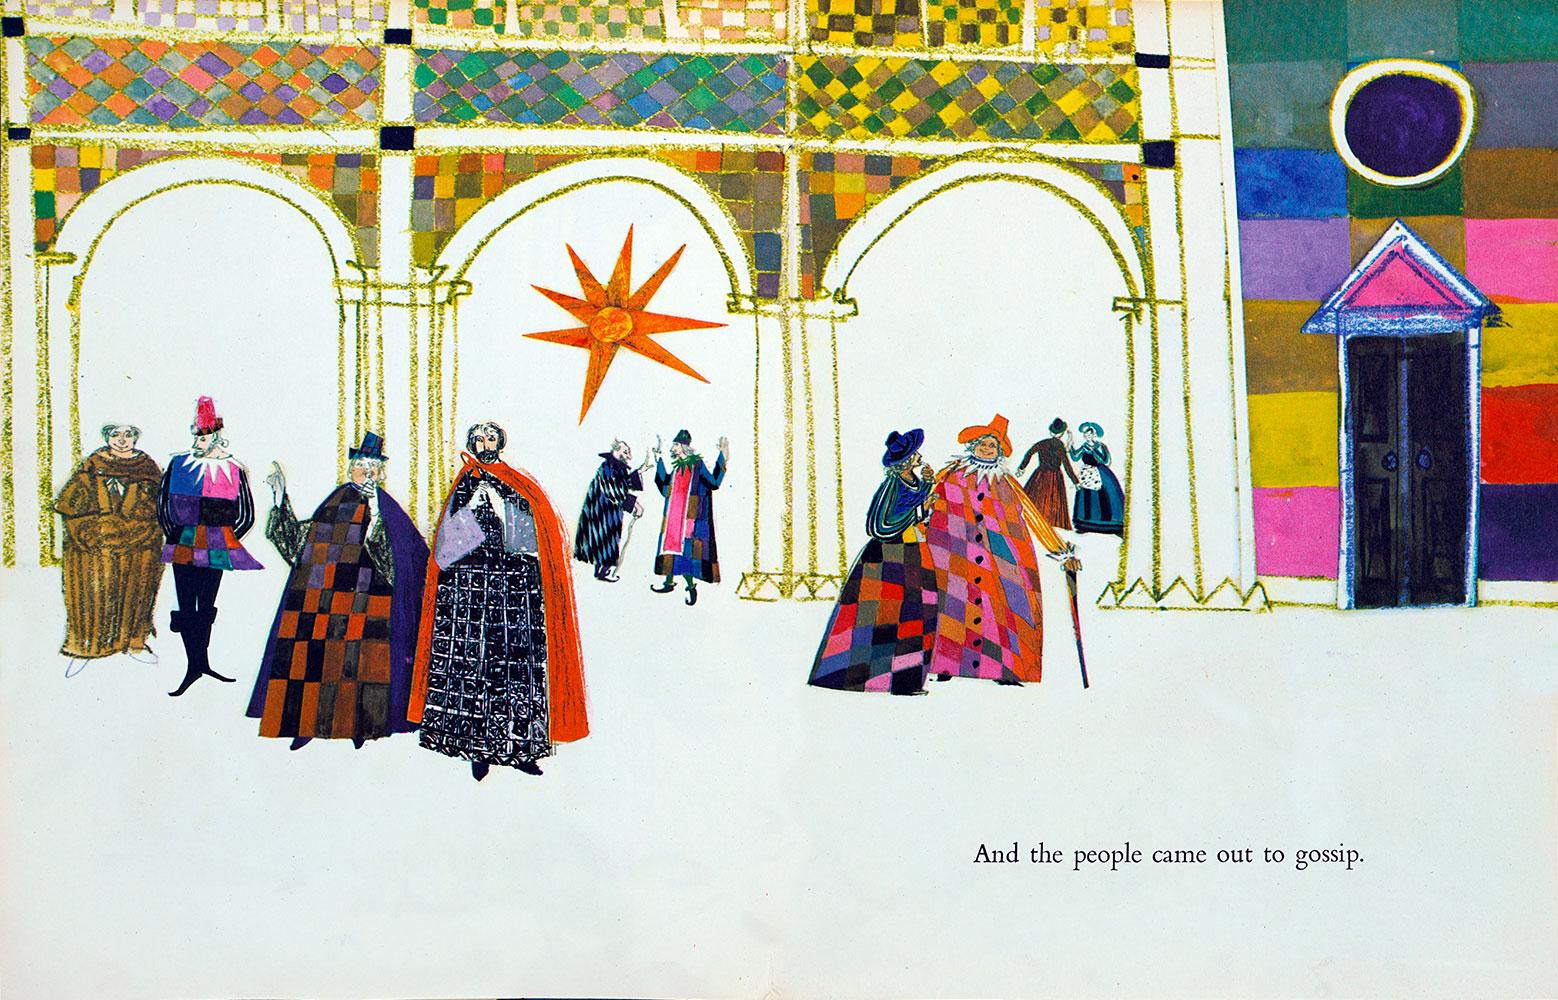 la-fontaine-the-north-wind-and-the-sun-book-page-25-&-26-brian-wildsmith.jpg